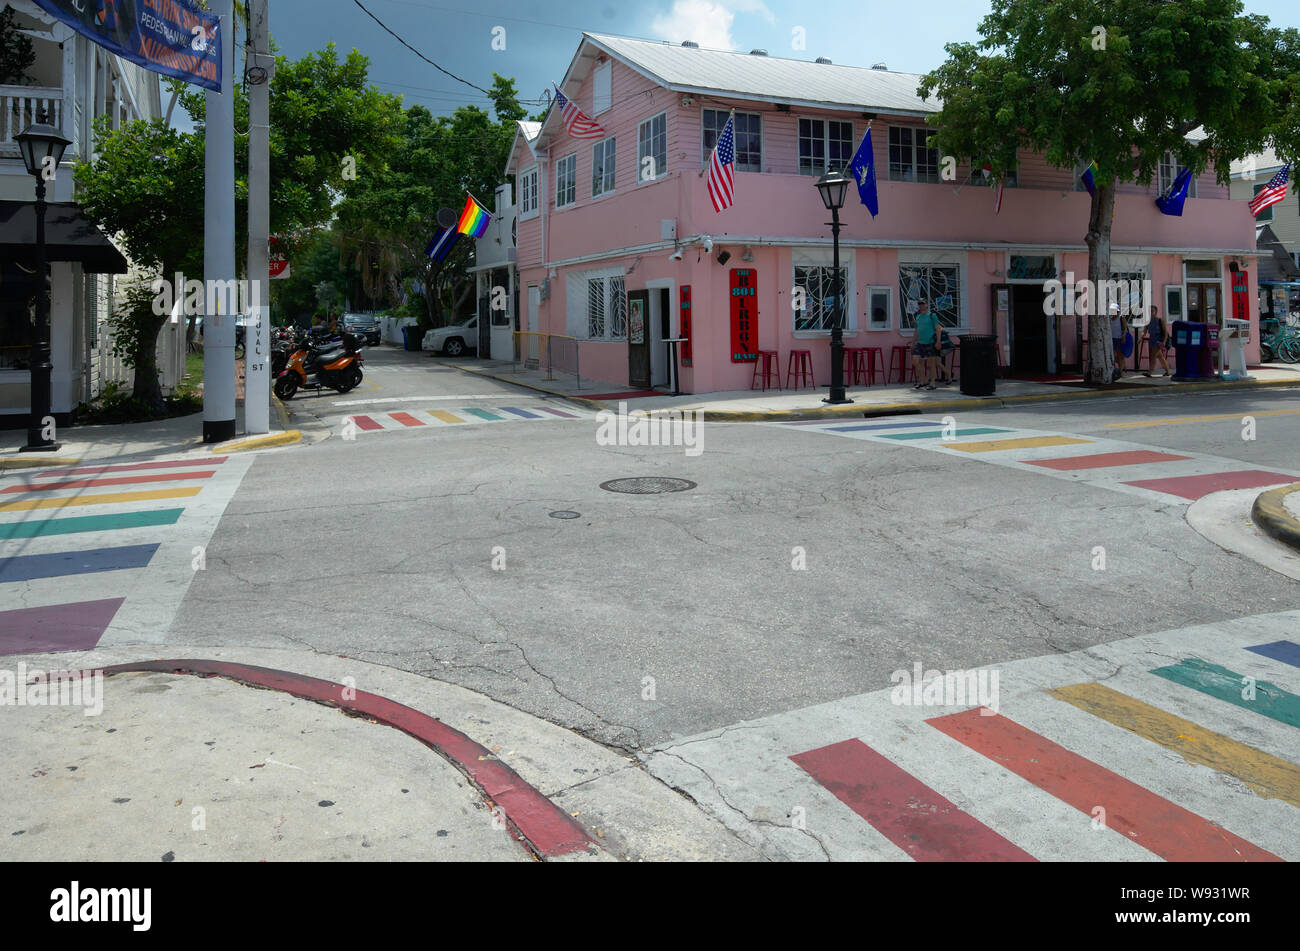 Rainbow cross roads on Duval Street, Key West, Florida. Stock Photo